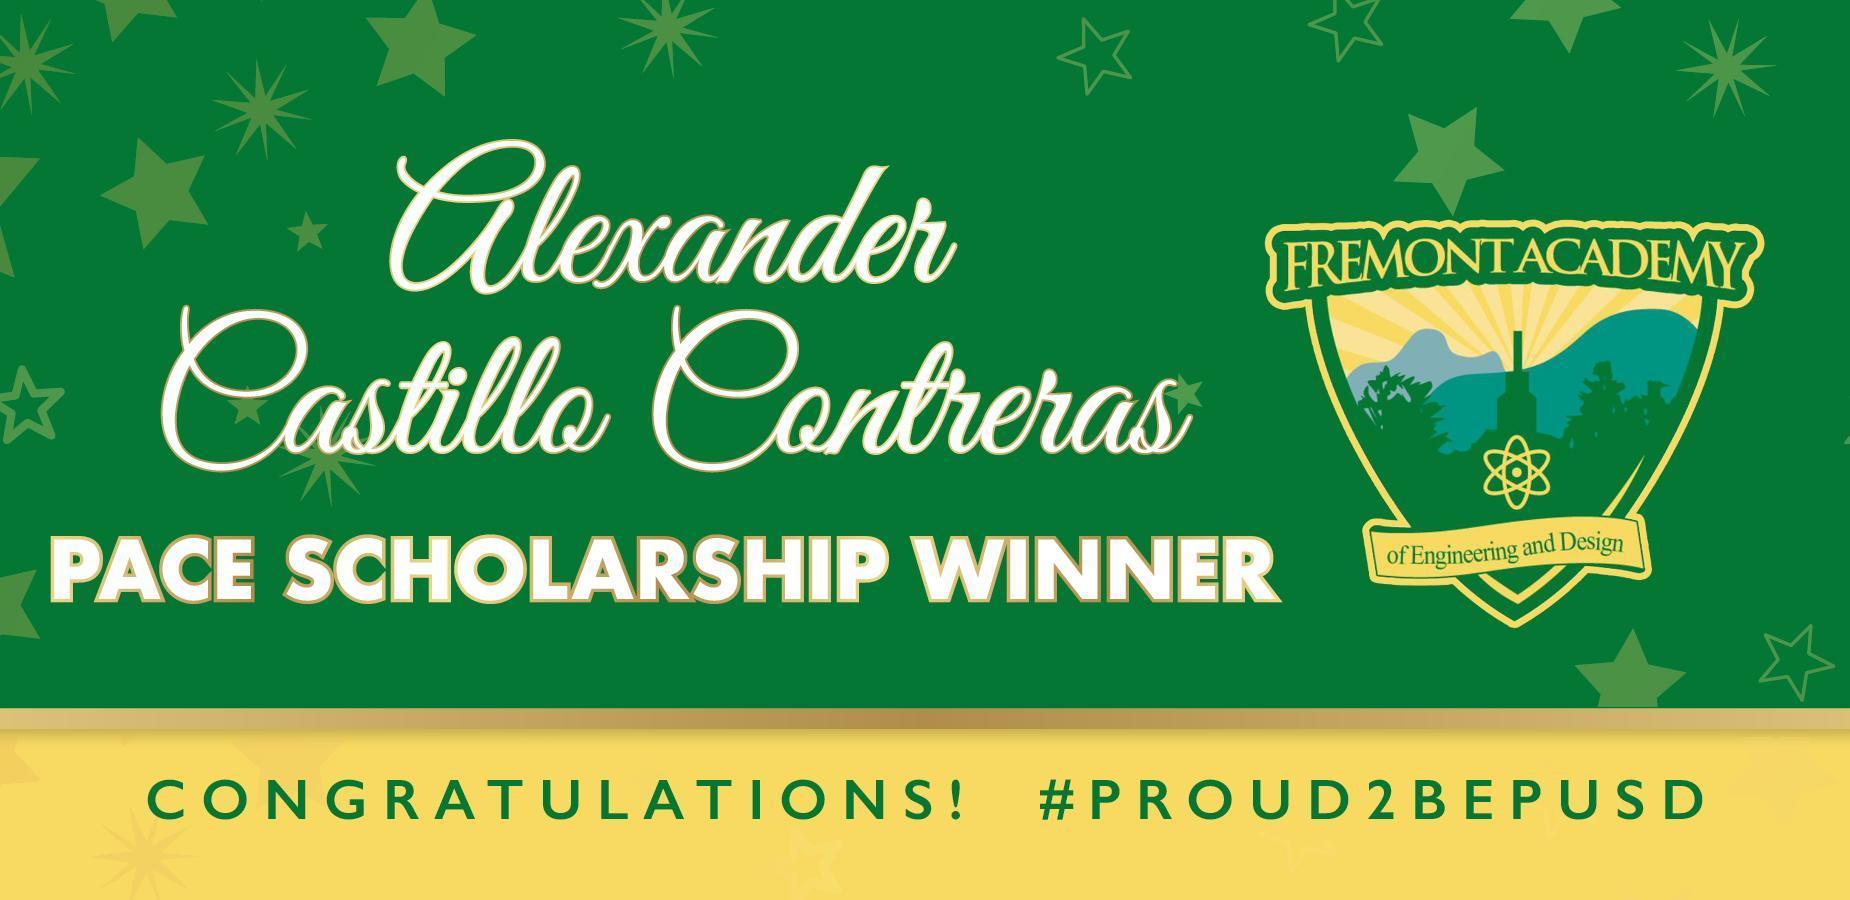 We are #PROUD of Alexander! Winner of the @PomonaUnified #PACE #Scholarship! #proud2bePUSD #CityOfPomona #Pomona #PUSD #Fremont #Classof2020